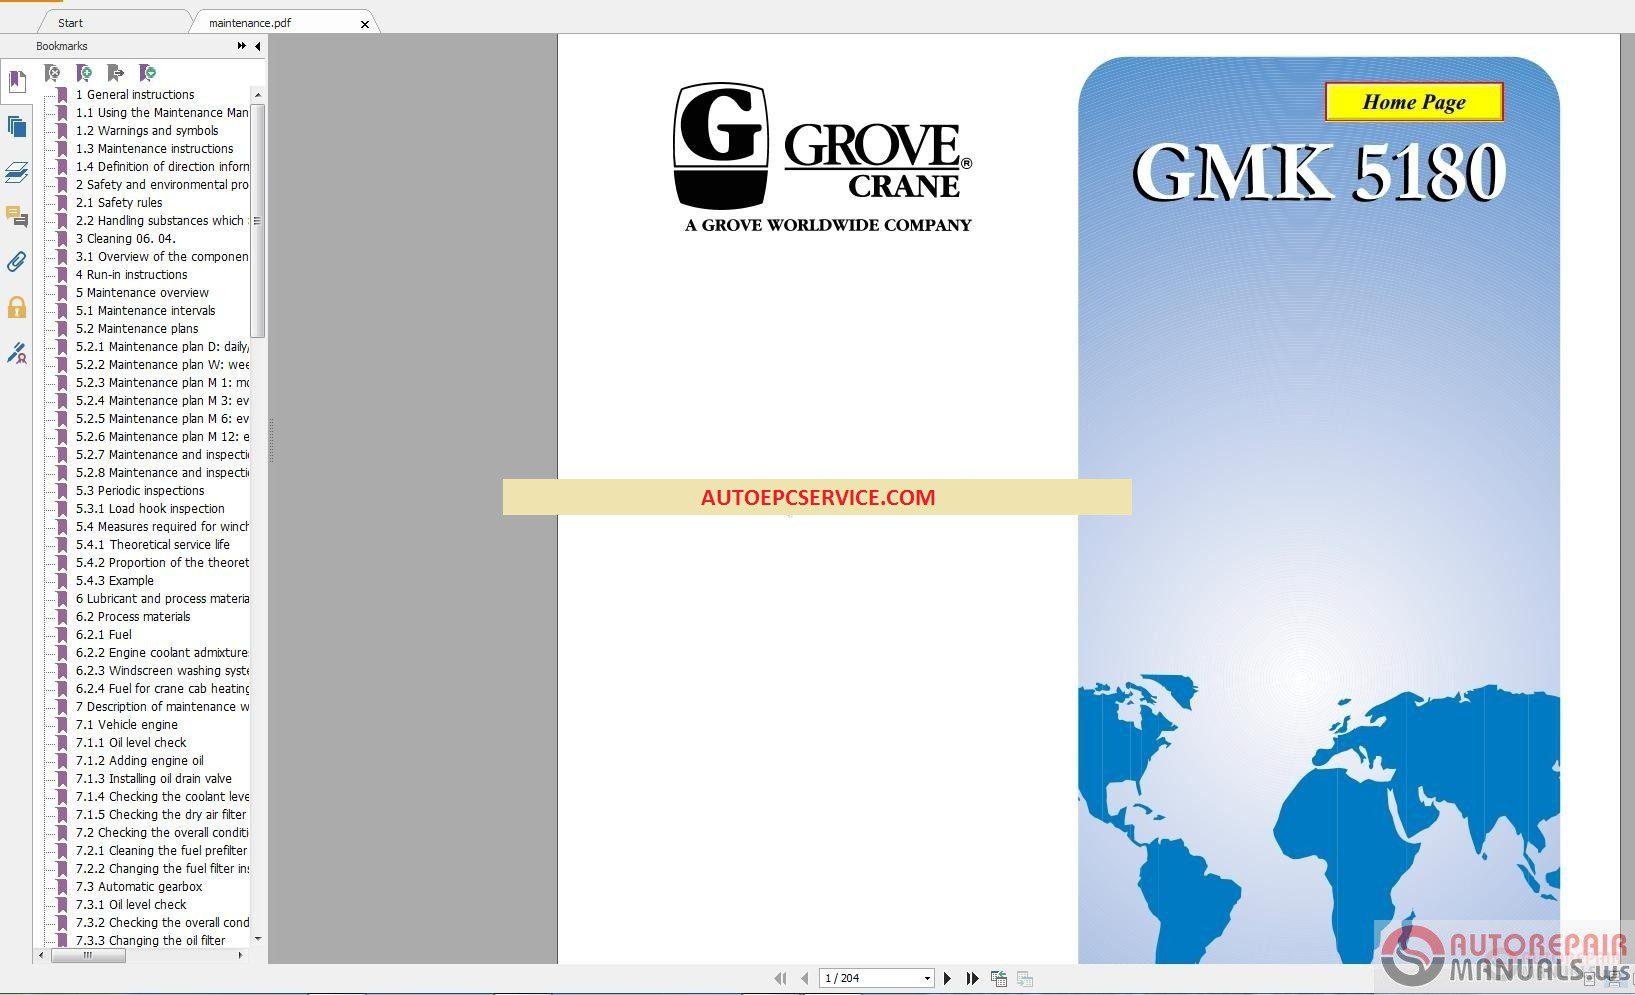 Grove Mobile Cranes GMK Models Full Service & Maintenance Manual DVD – Auto  Repair Software-Auto EPC Software-Auto Repair Manual-Workshop Manual-Service  ...